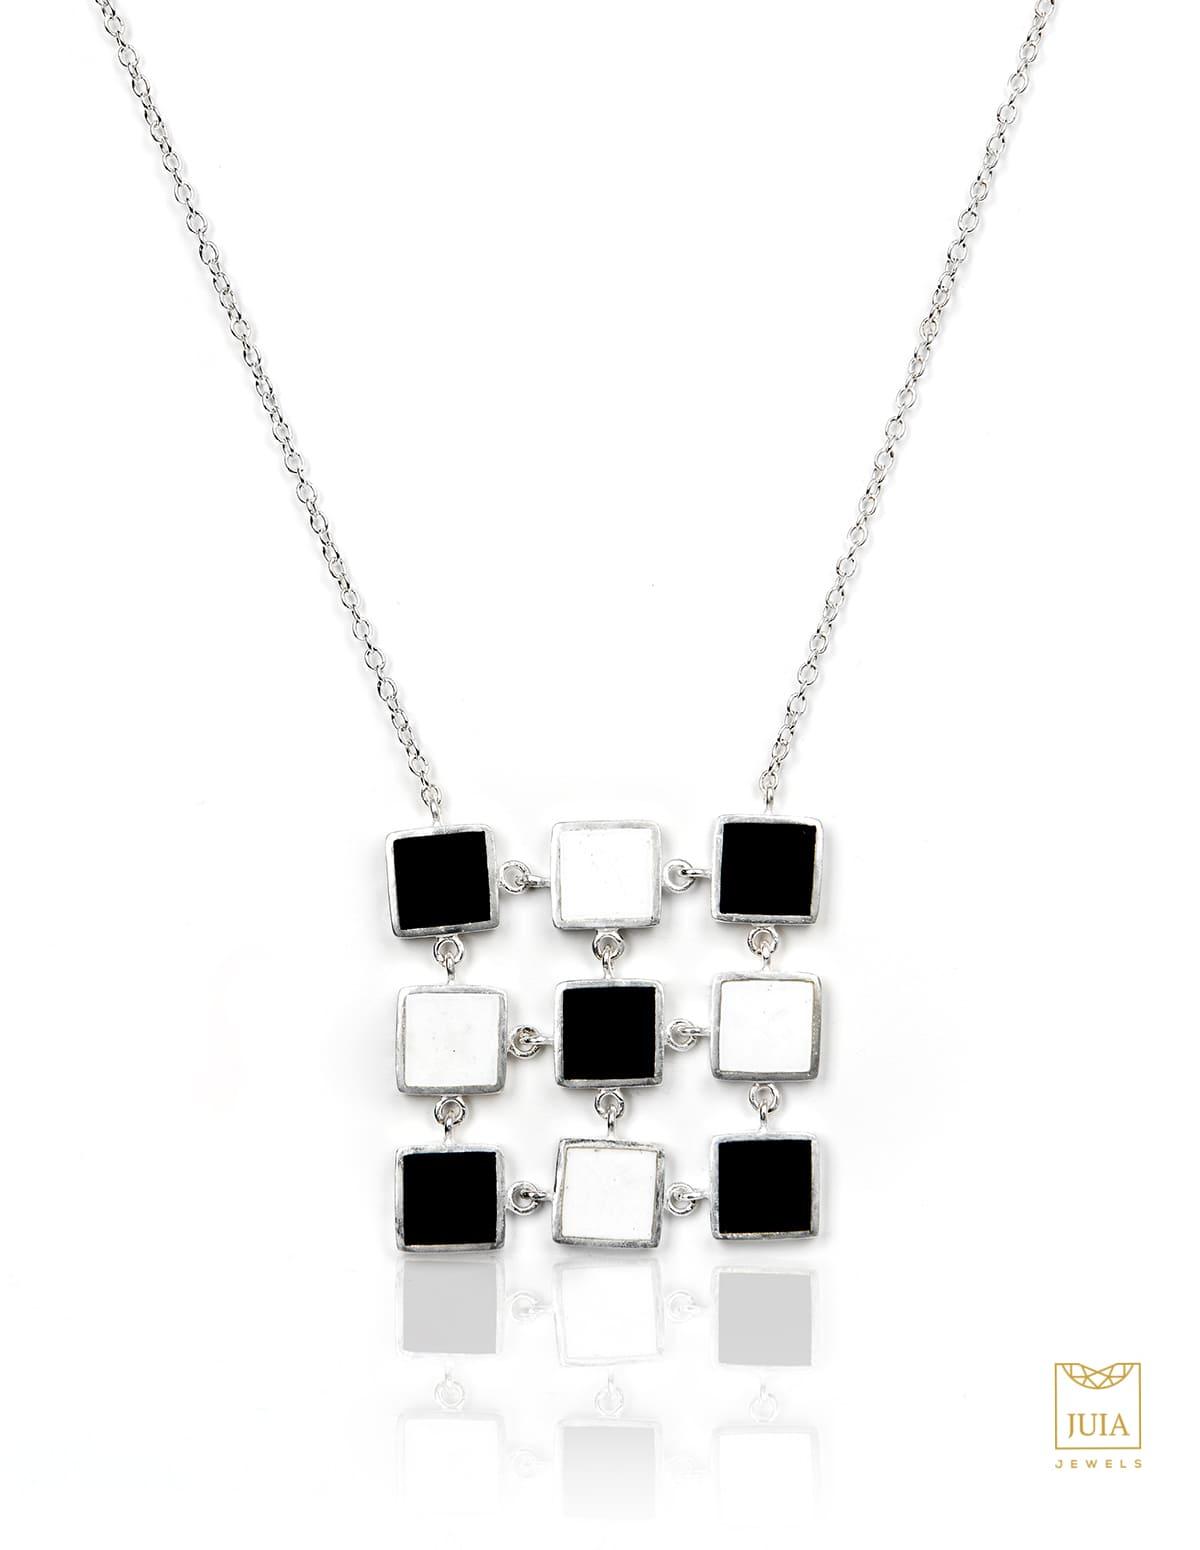 collares de plata para mujer, joyas artesanales, joyas para regalar, juia jewels barcelona, joyasmarket